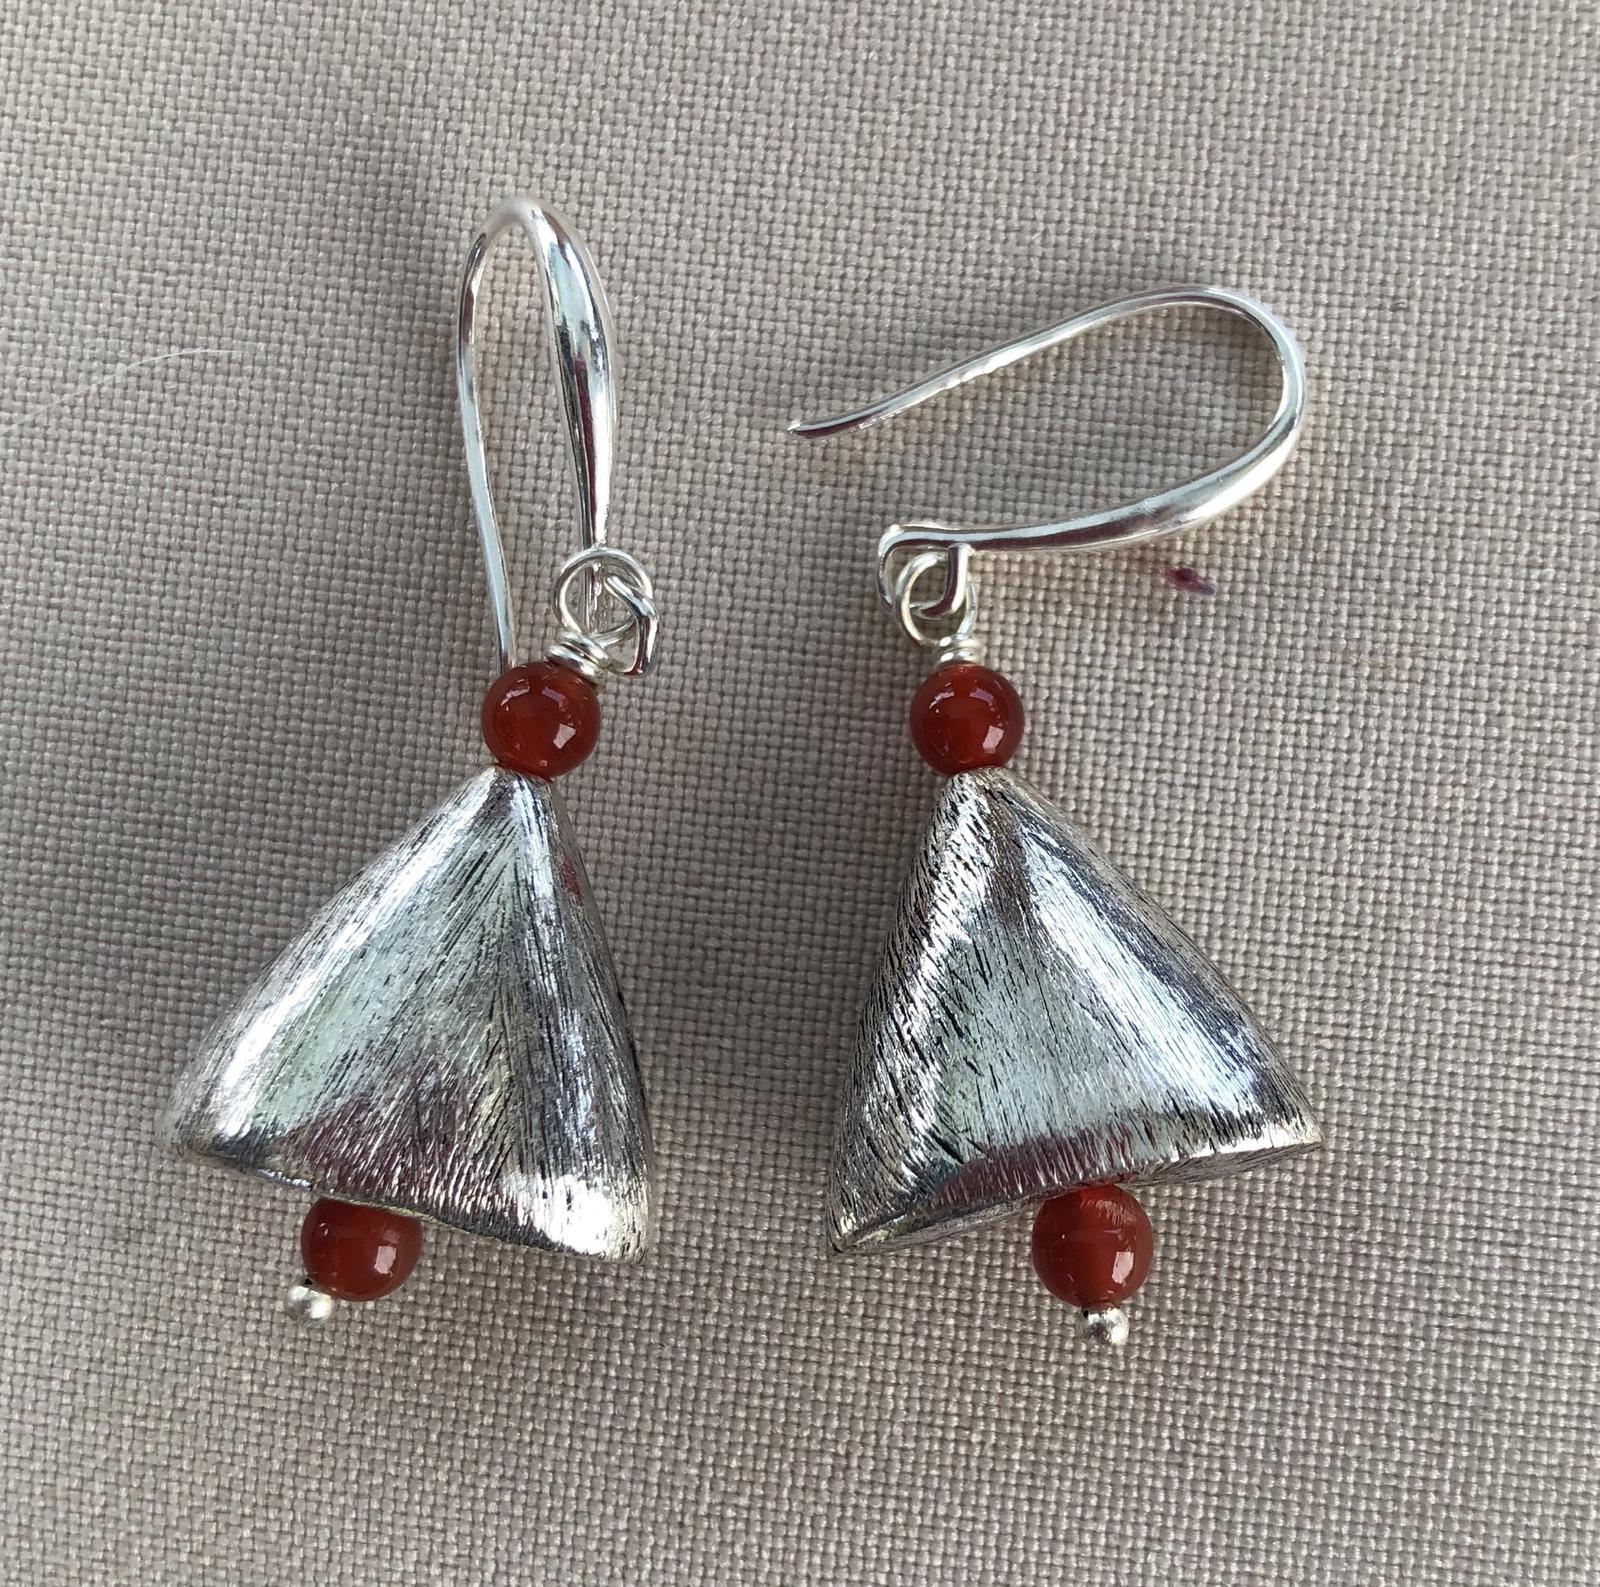 Sterling silver plate and carnelian beads earrings